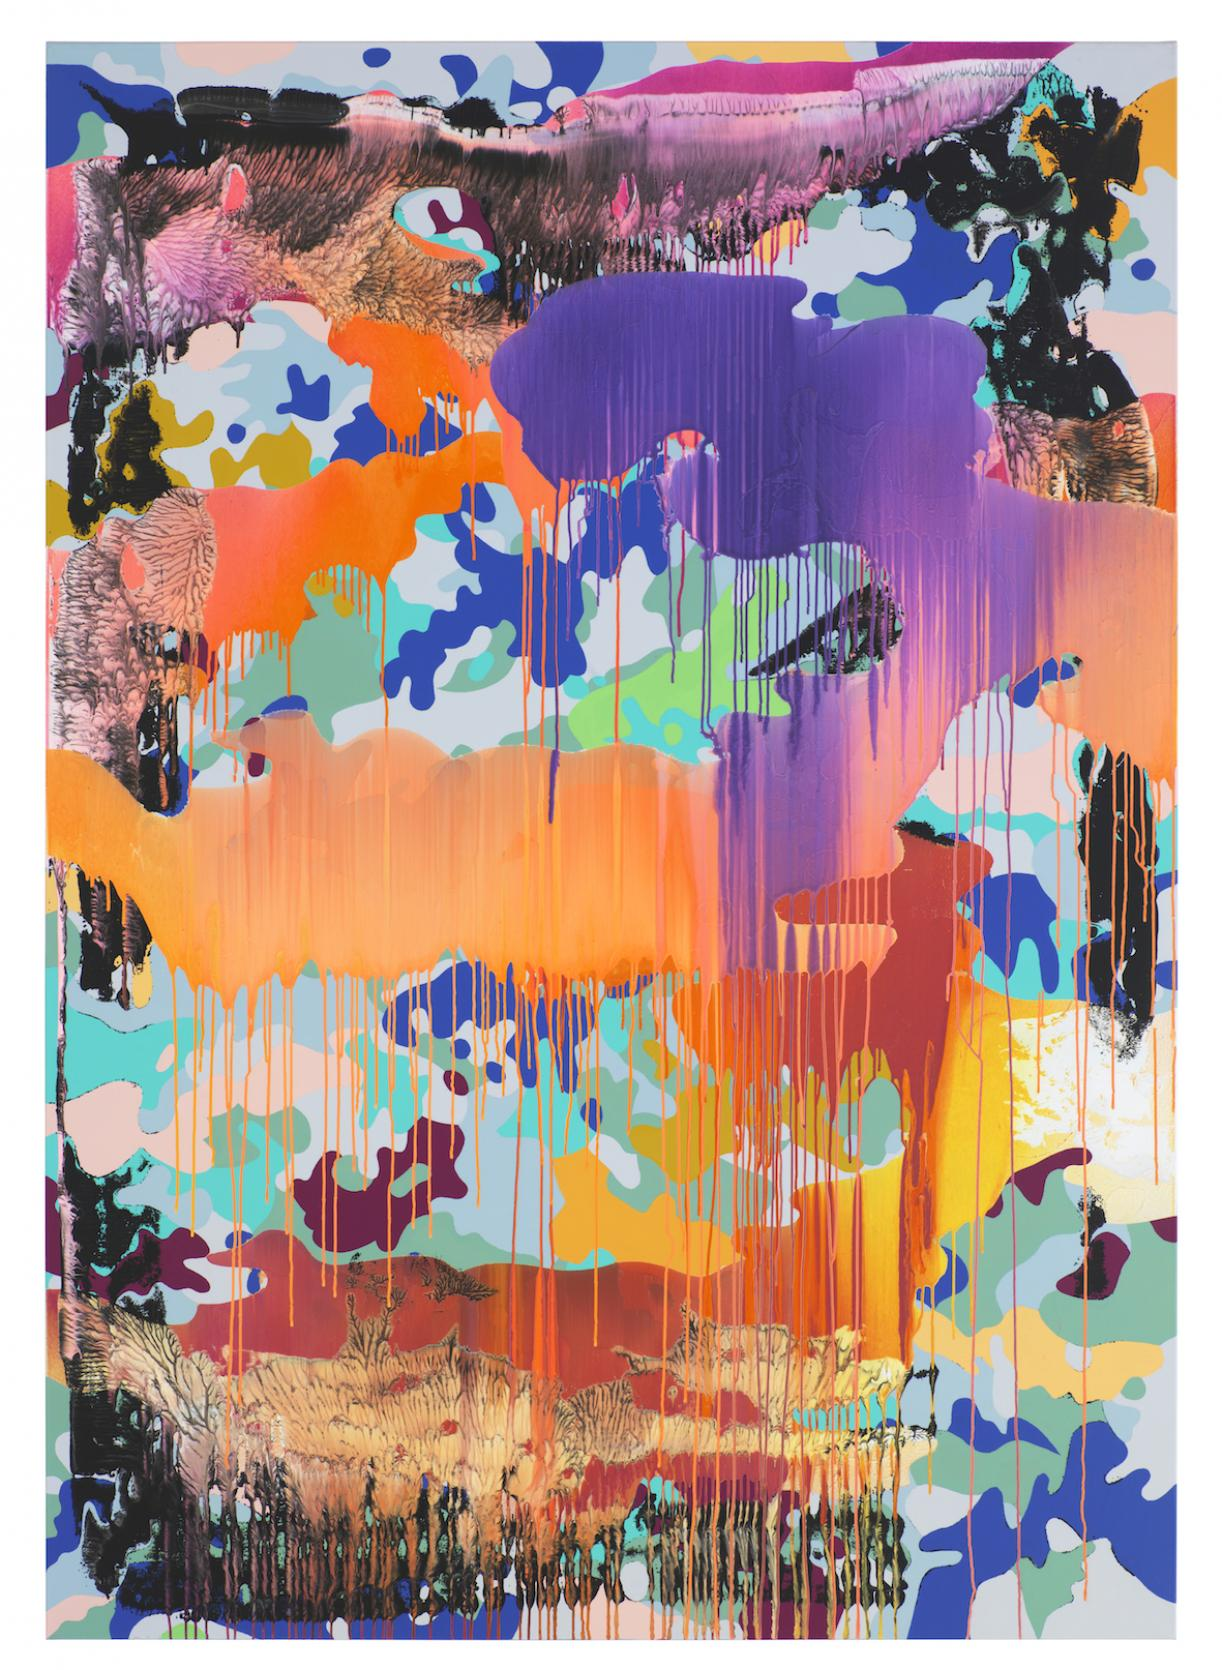 Christine Streuli, Warainting_008, 2016/17, Mixed media on canvas, 243,5 x 173 cm